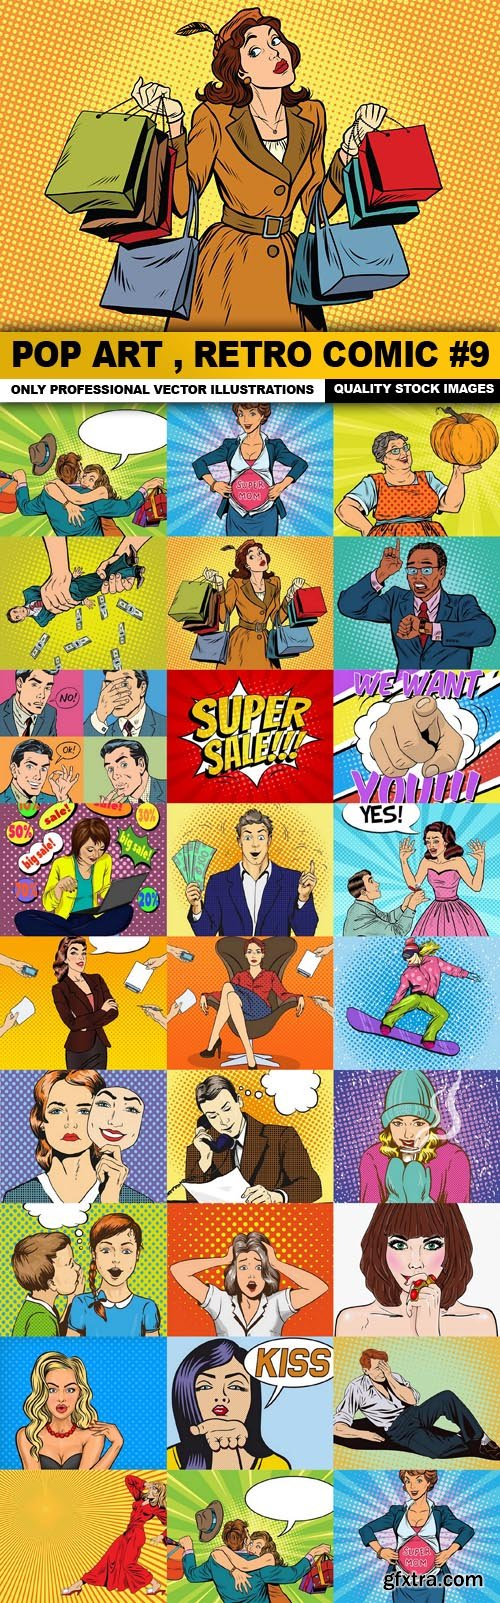 Pop Art , Retro Comic #9 - 25 Vector